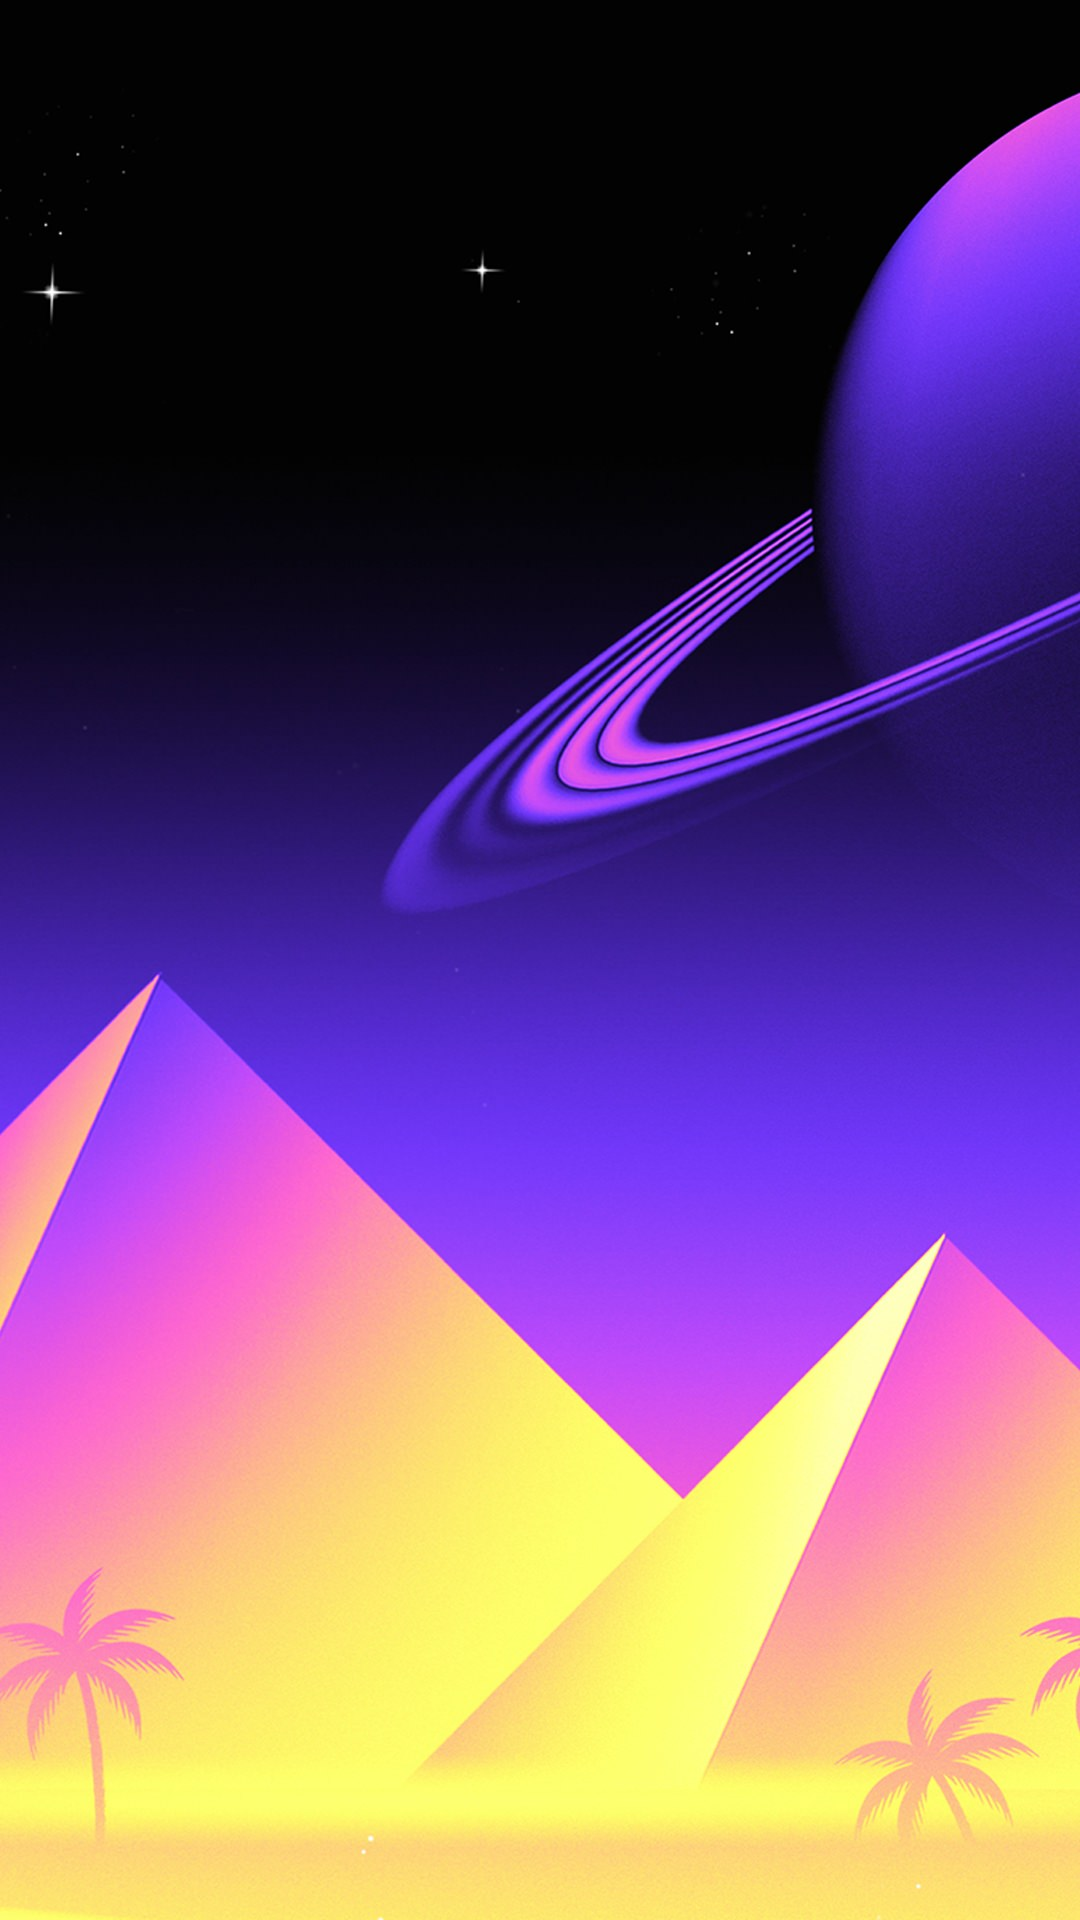 iPhone X (VaporWave) [2436 x 1125] imagens